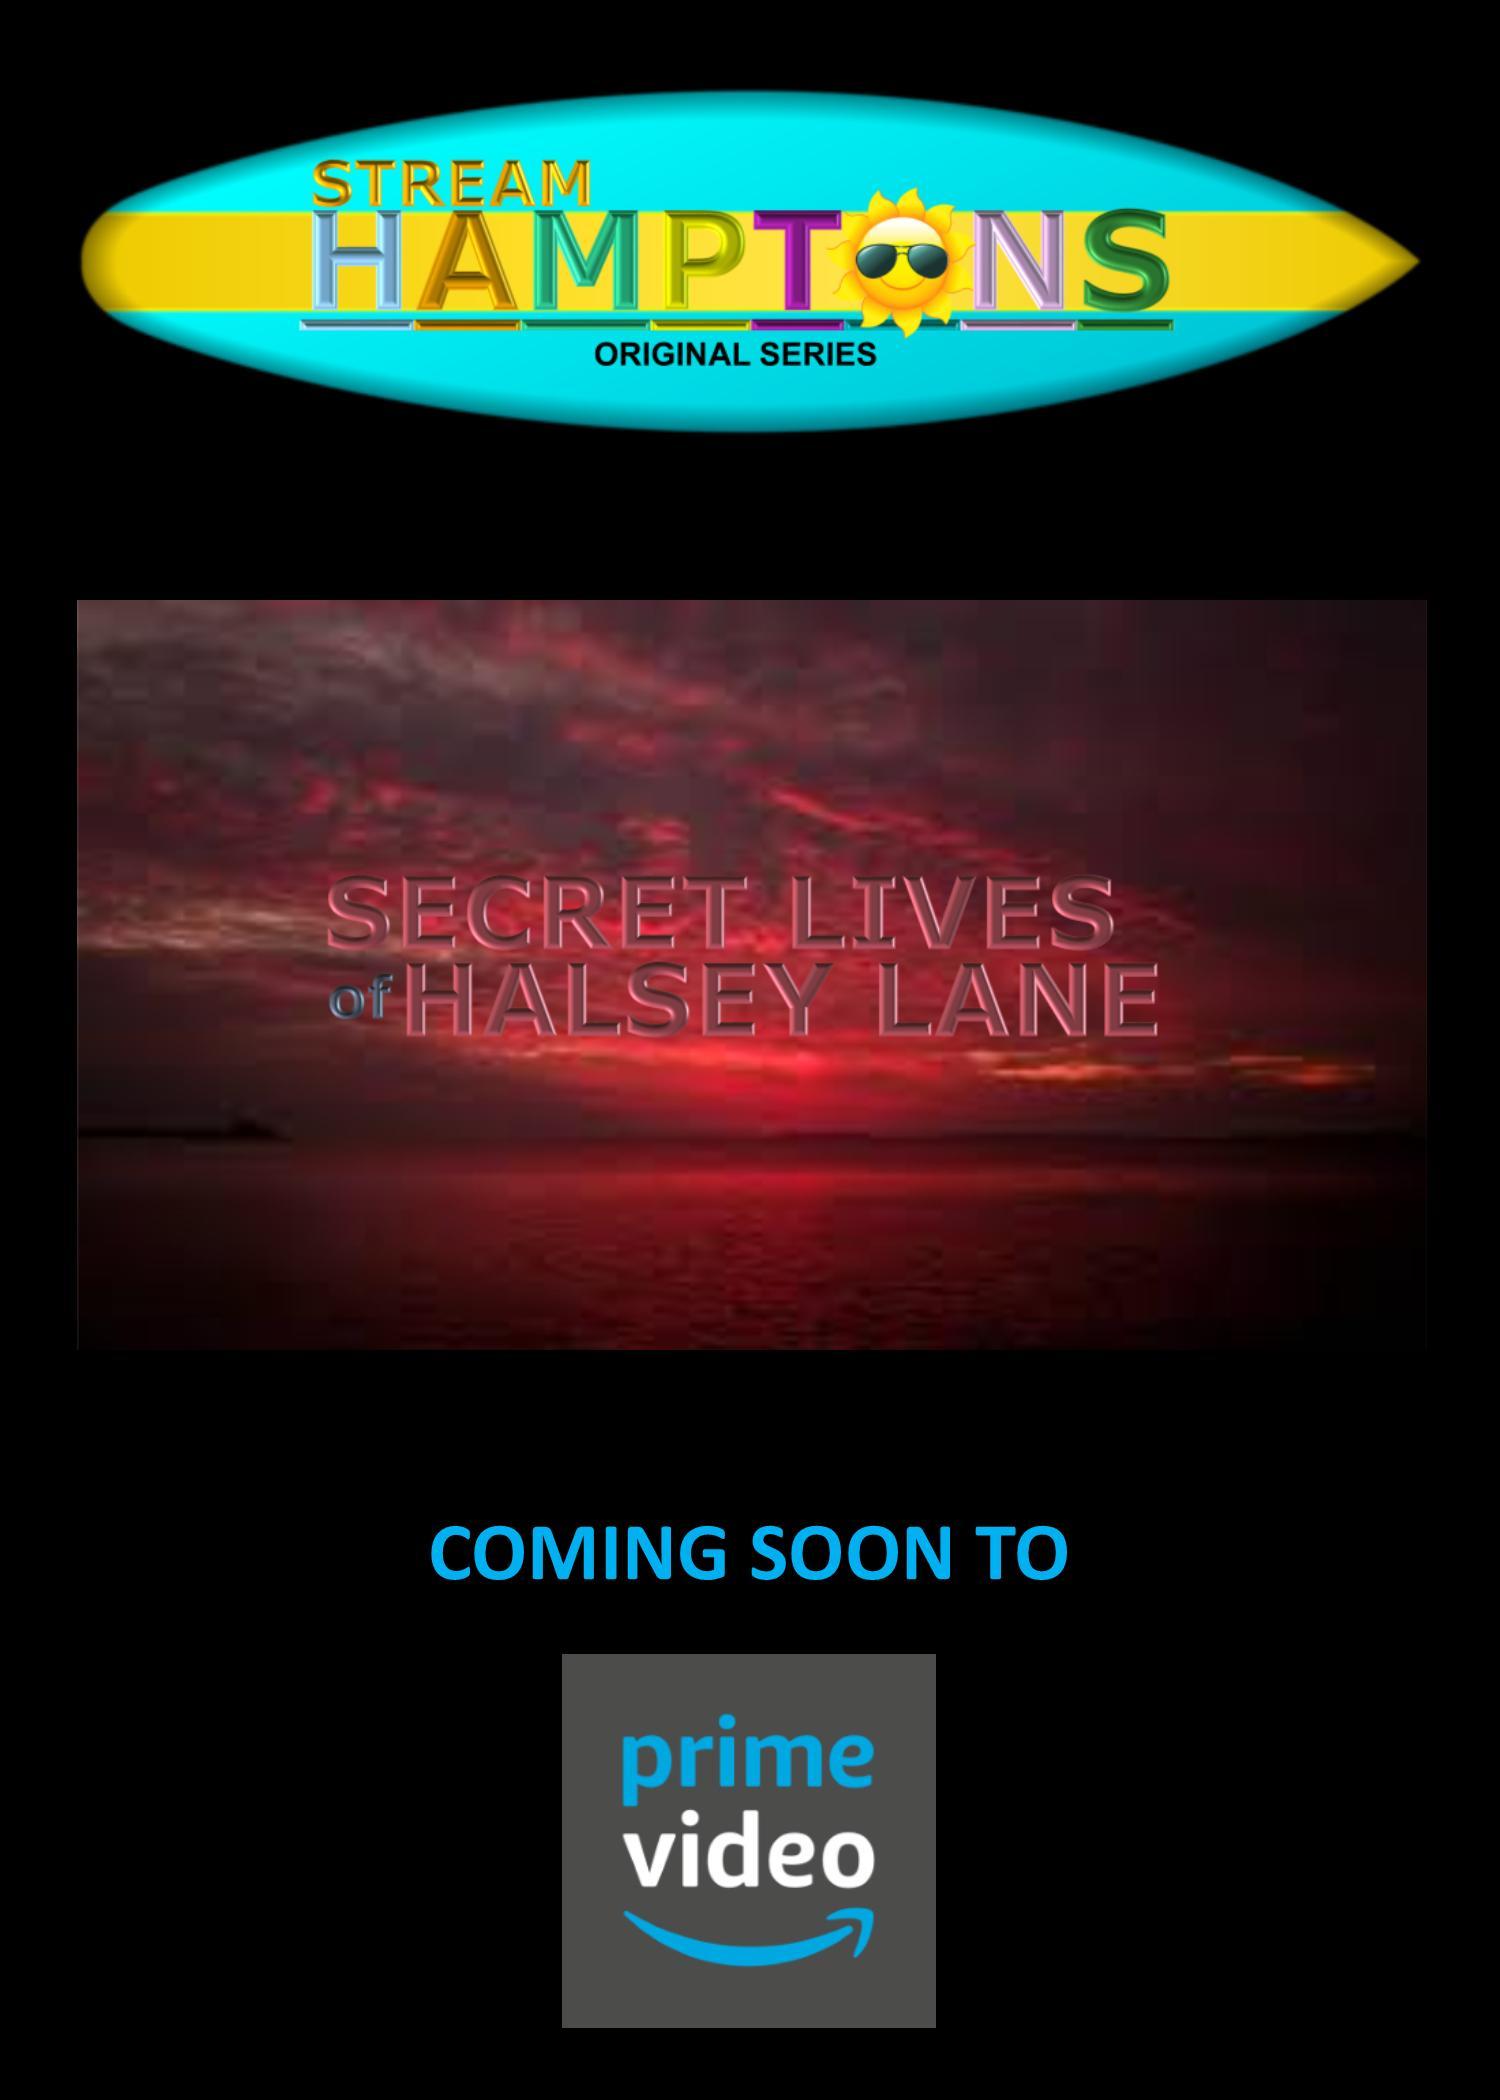 Secret lives of halsey lane (TV Series) - IMDb